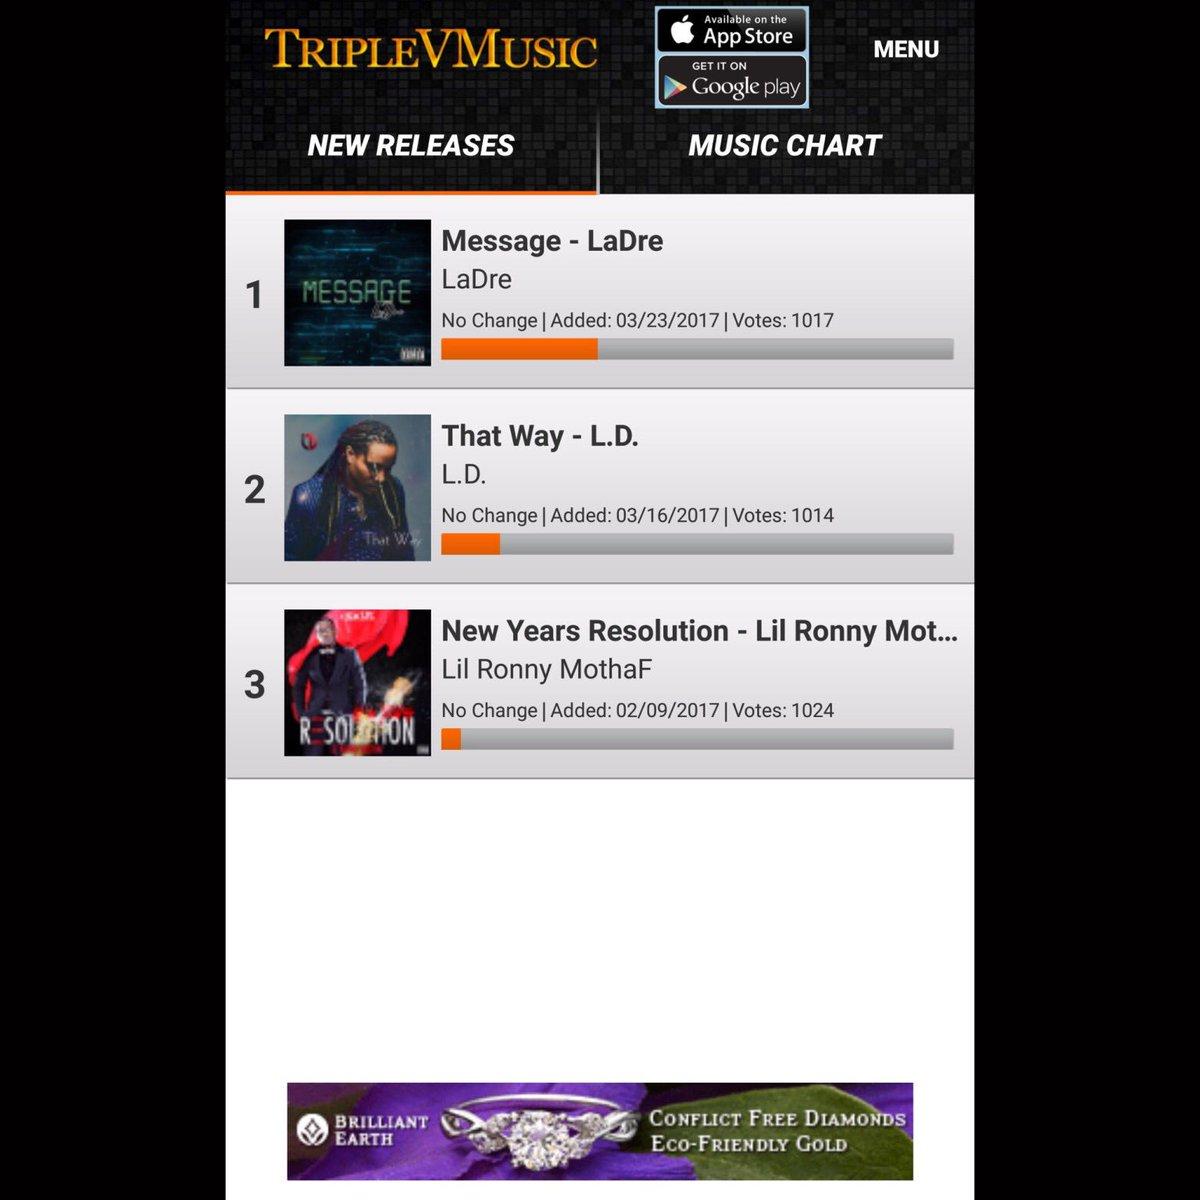 RT &amp; LIKE Voting Starts Today @TripleVMusic App for #LaDre #LilRonny &amp; #LDMusic!!! #Music #MusicNews @BrilliantEarth ad<br>http://pic.twitter.com/1mkQRPZknF